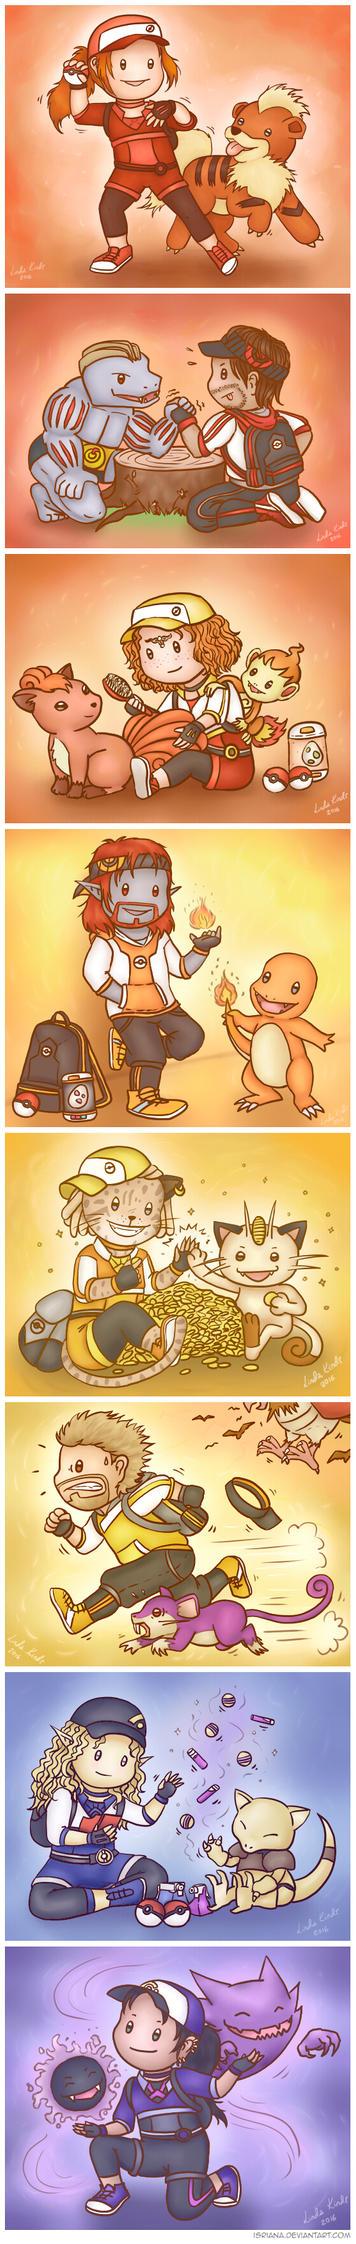 TES meets Pokemon GO by Isriana